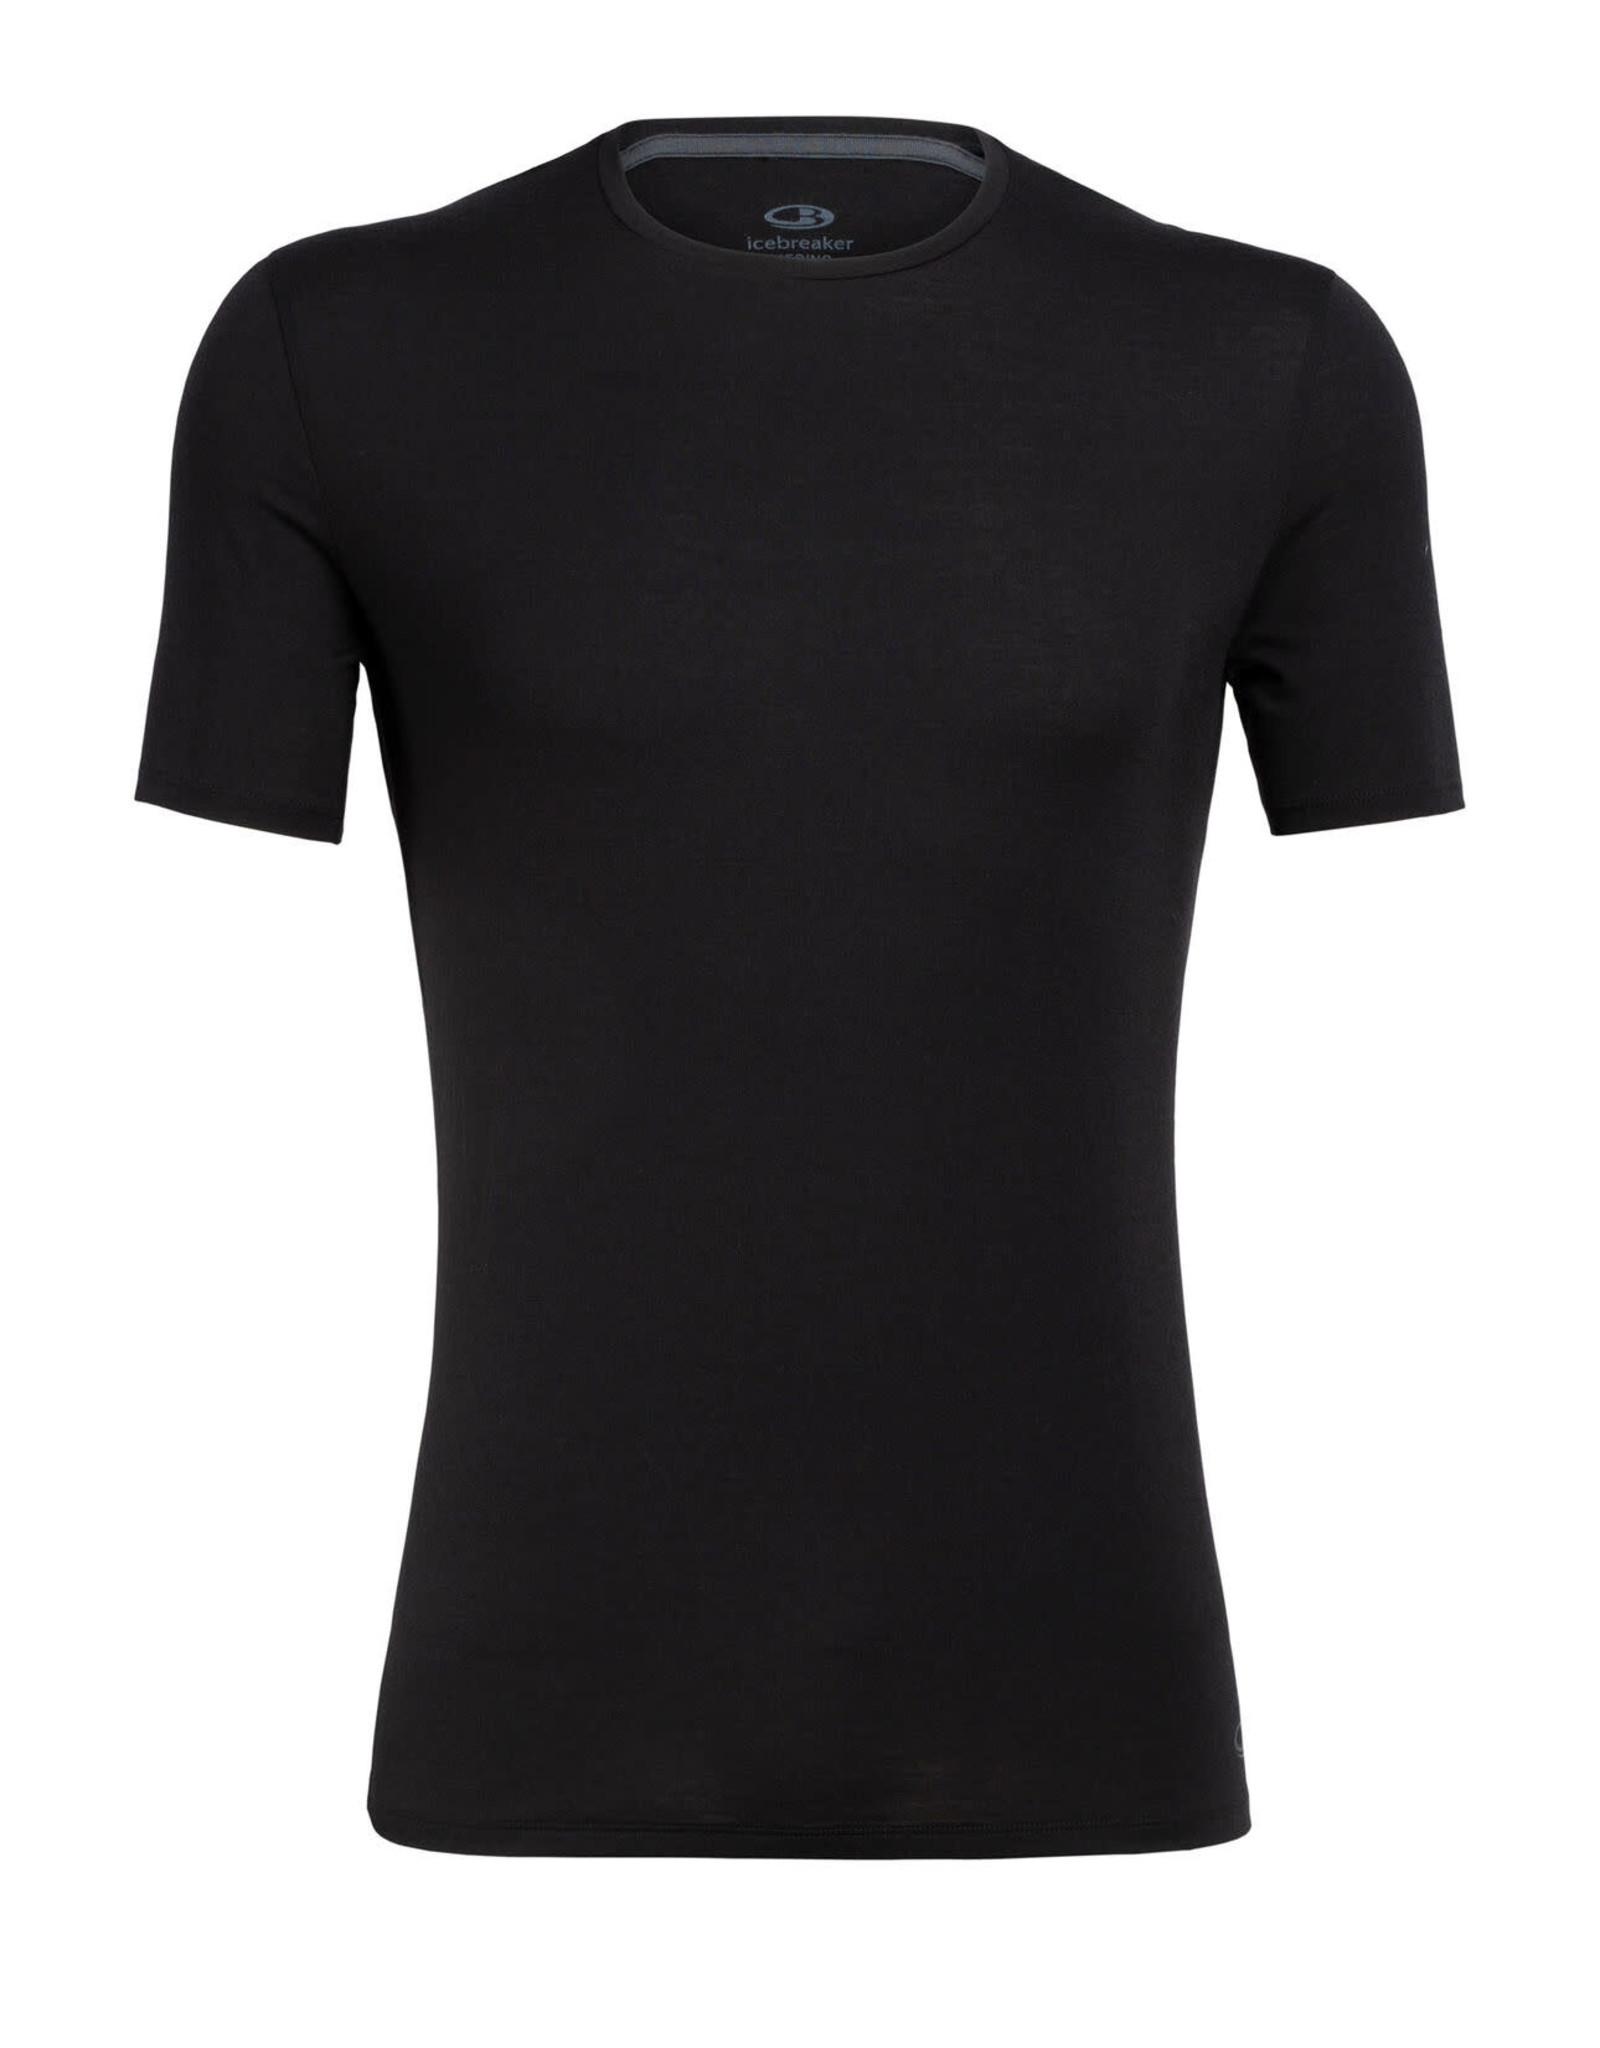 Ice Breaker Anatomica tshirt